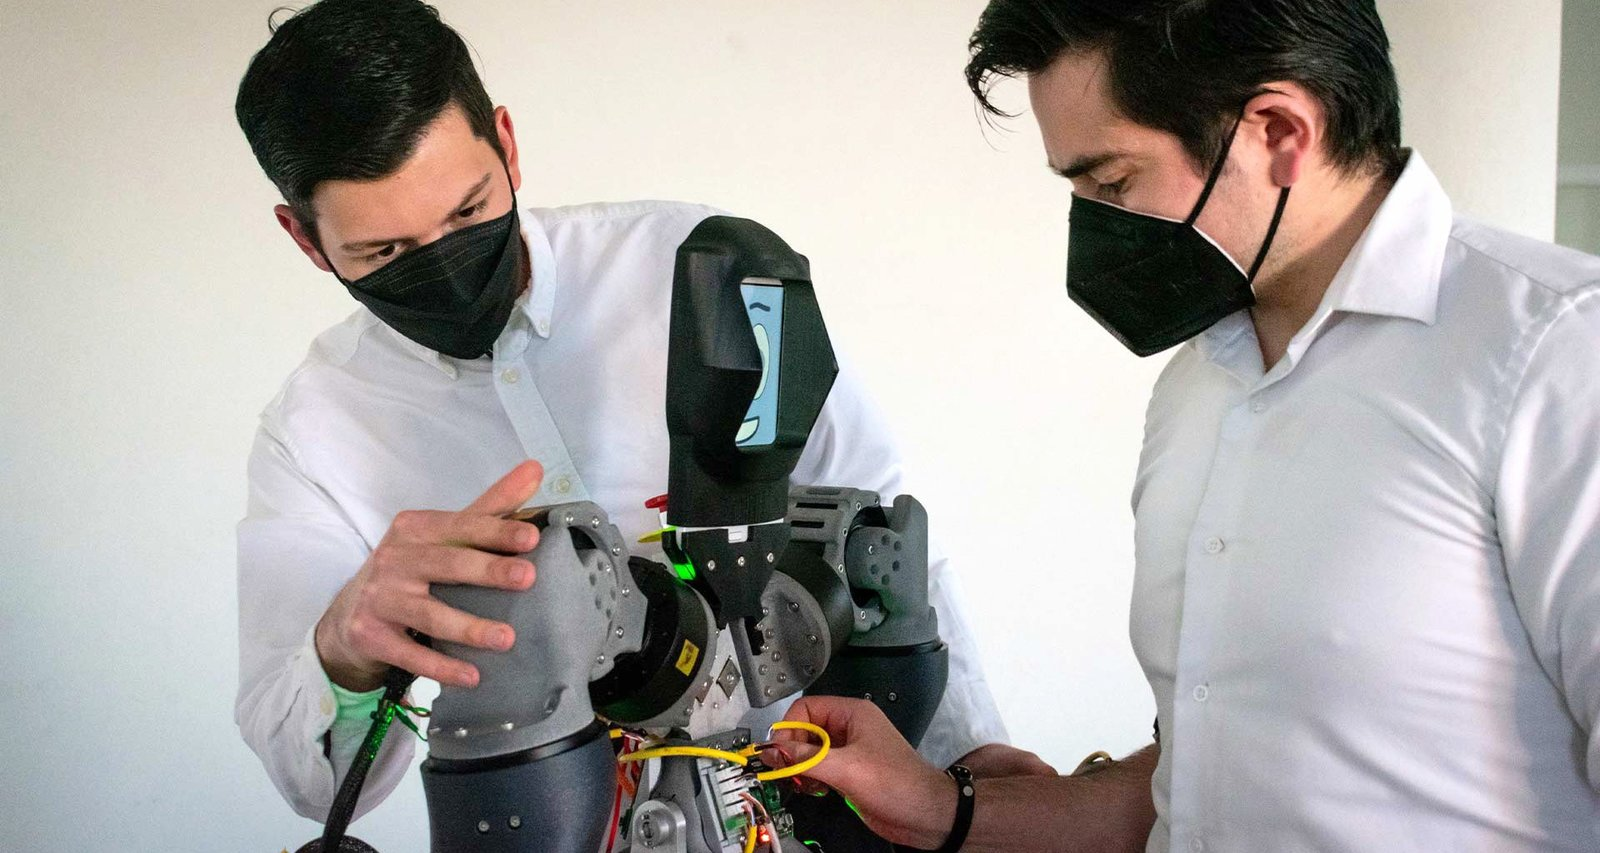 El Robot Wars 2021 se realizará en Monclova